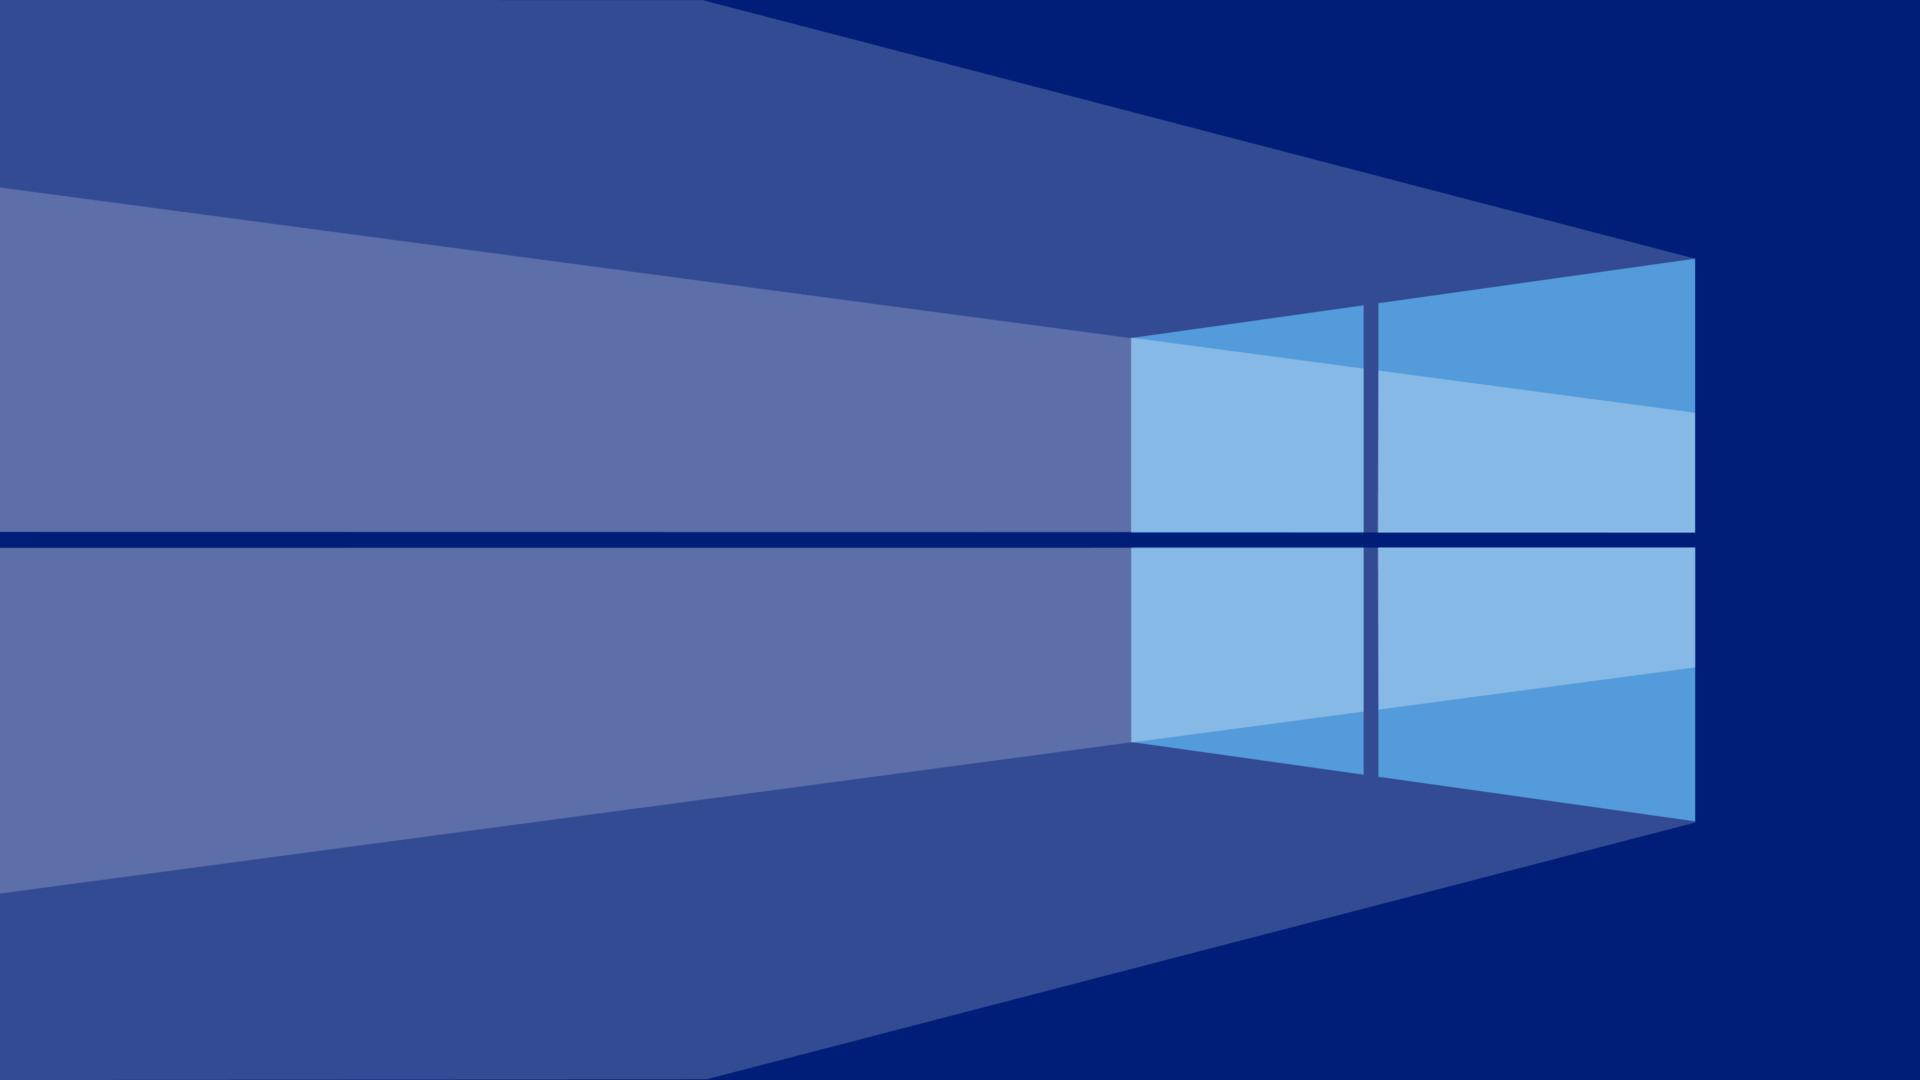 1920x1080 Windows 10 Original 4k Laptop Full Hd 1080p Hd 4k